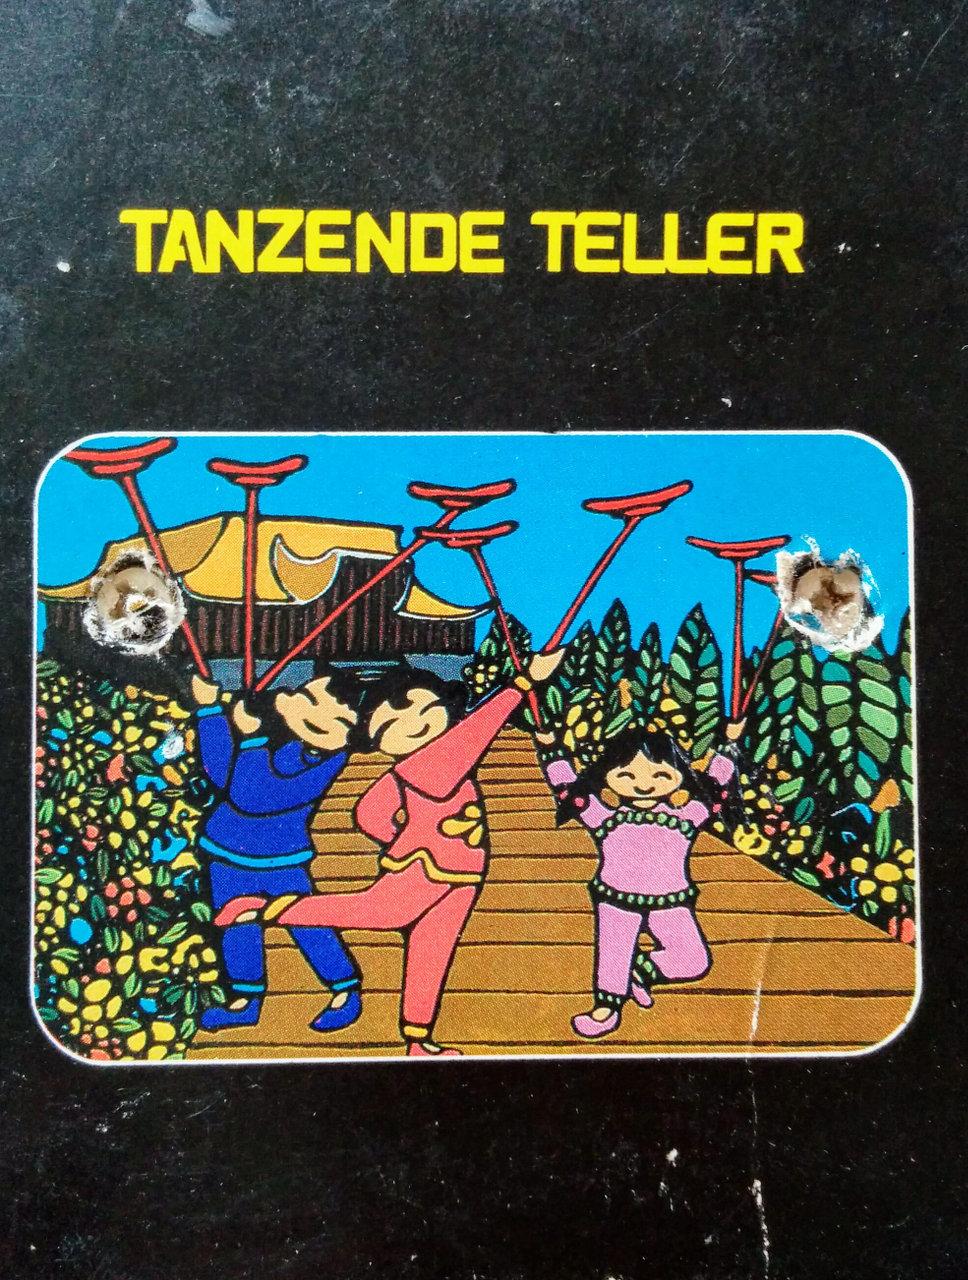 Cover des Spielmoduls, Tanzende Teller, Quelle, 1982. (Bild: Florian Weber)